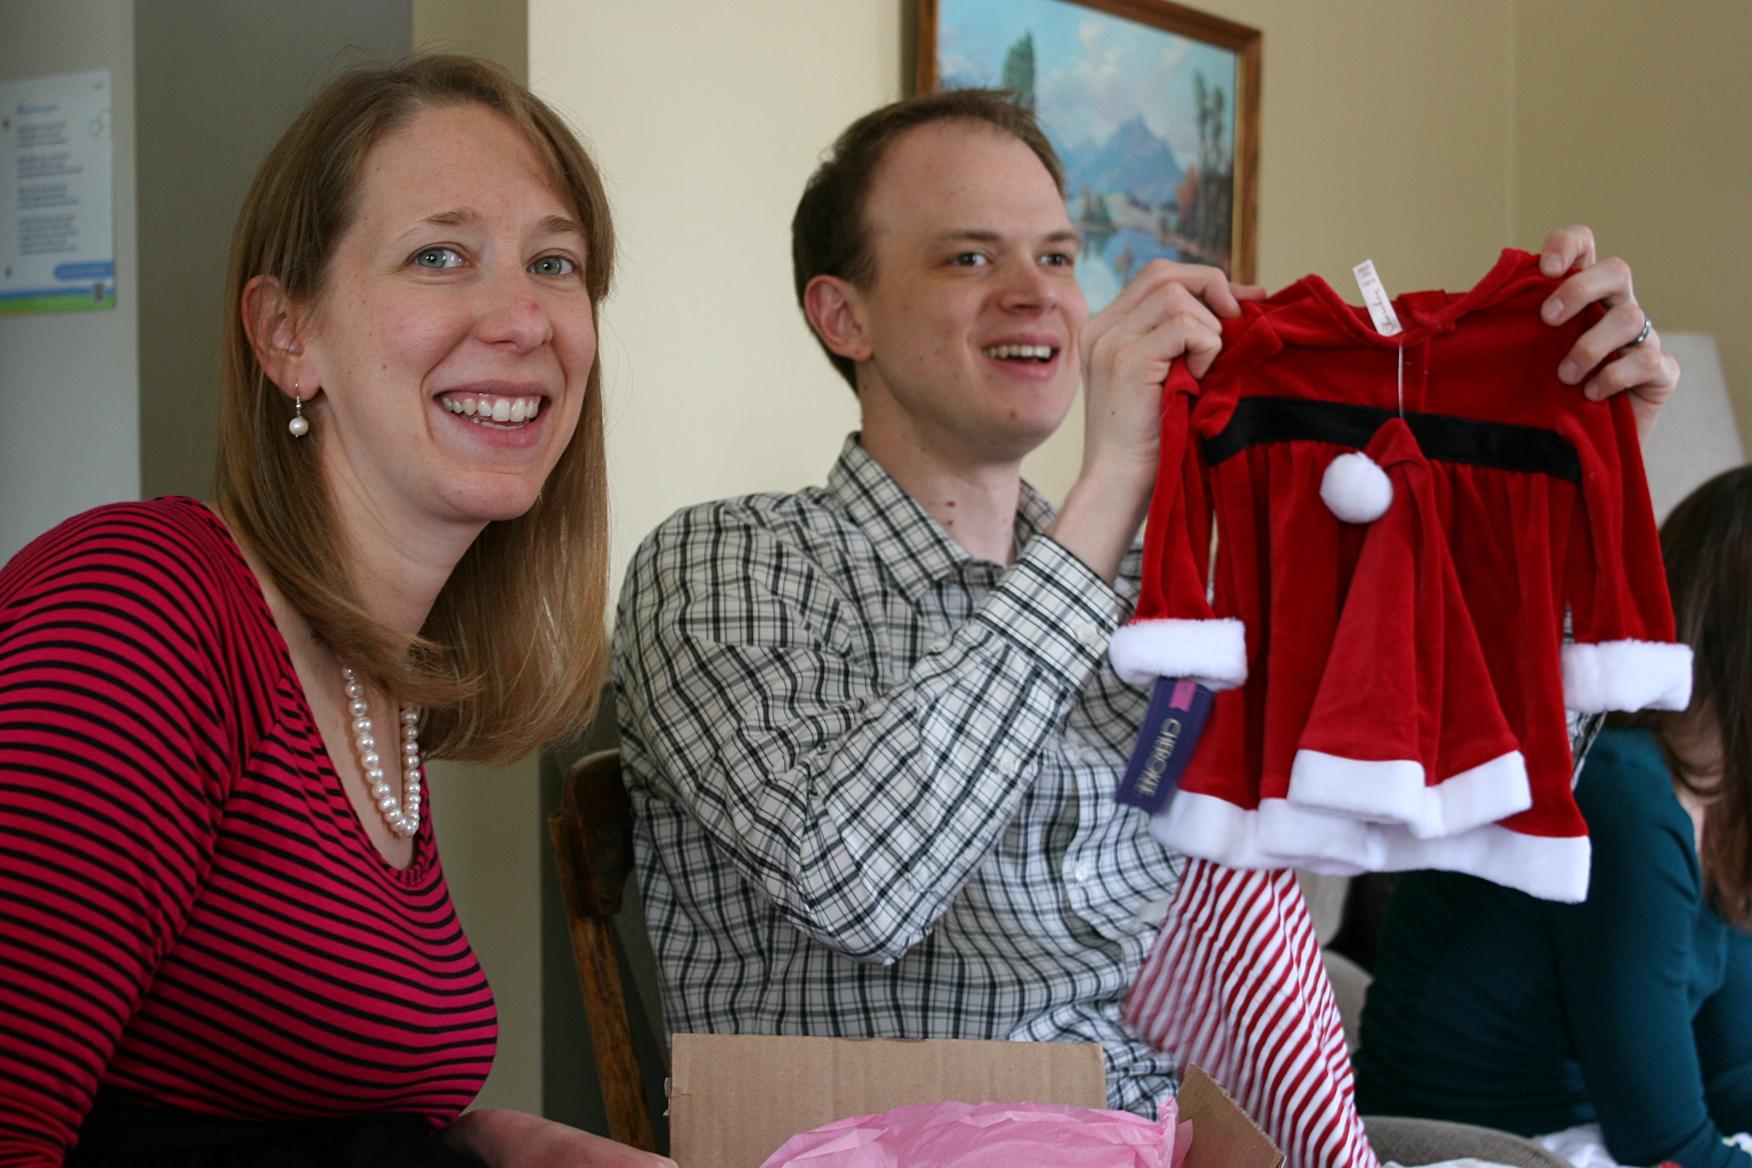 Baby shower ideas 66 Santa dress